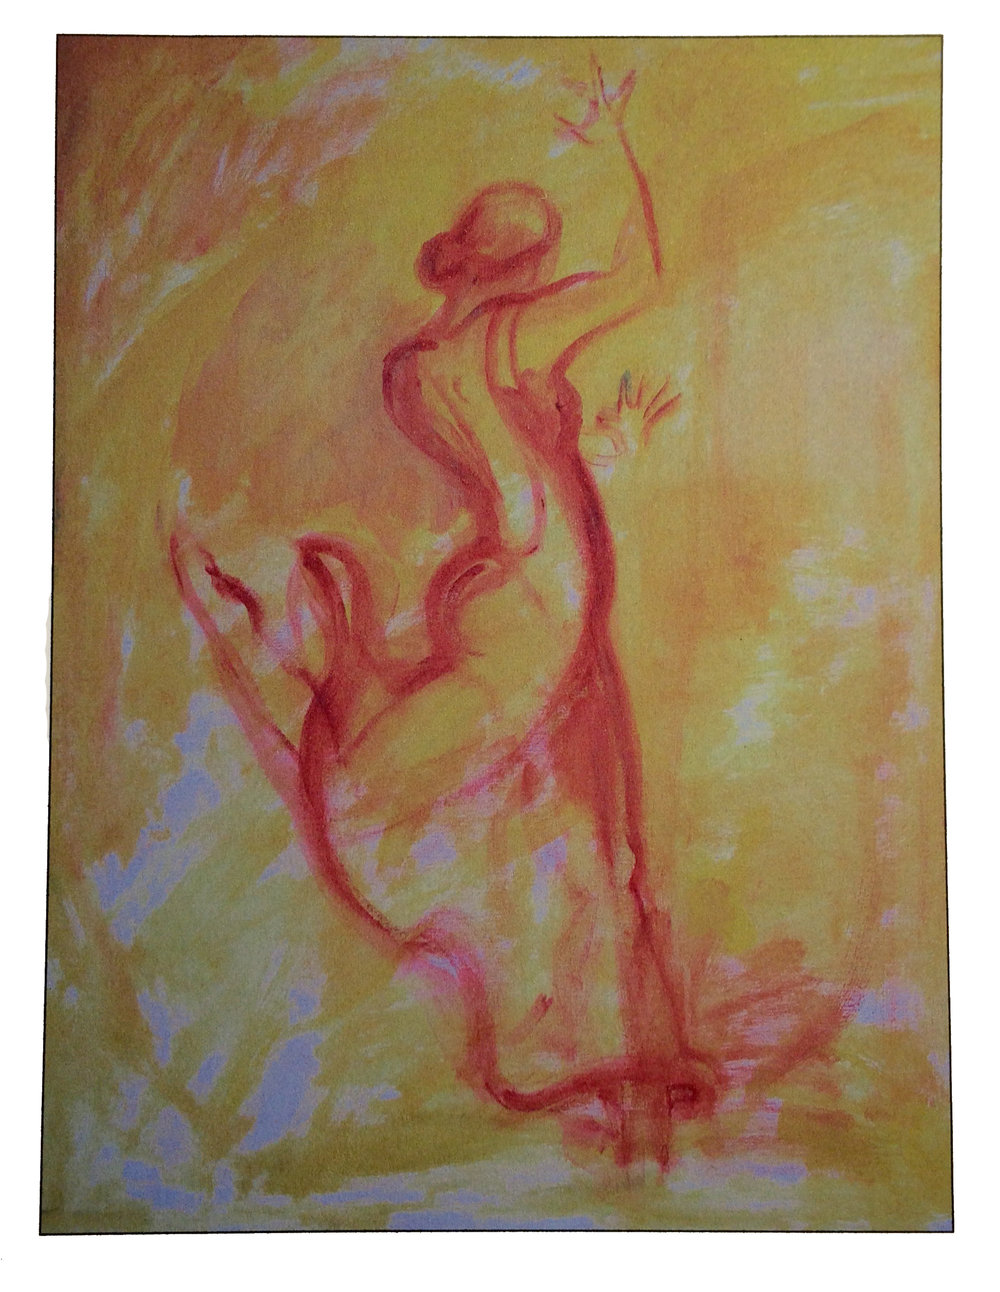 Dancer, 2010, Acrylic